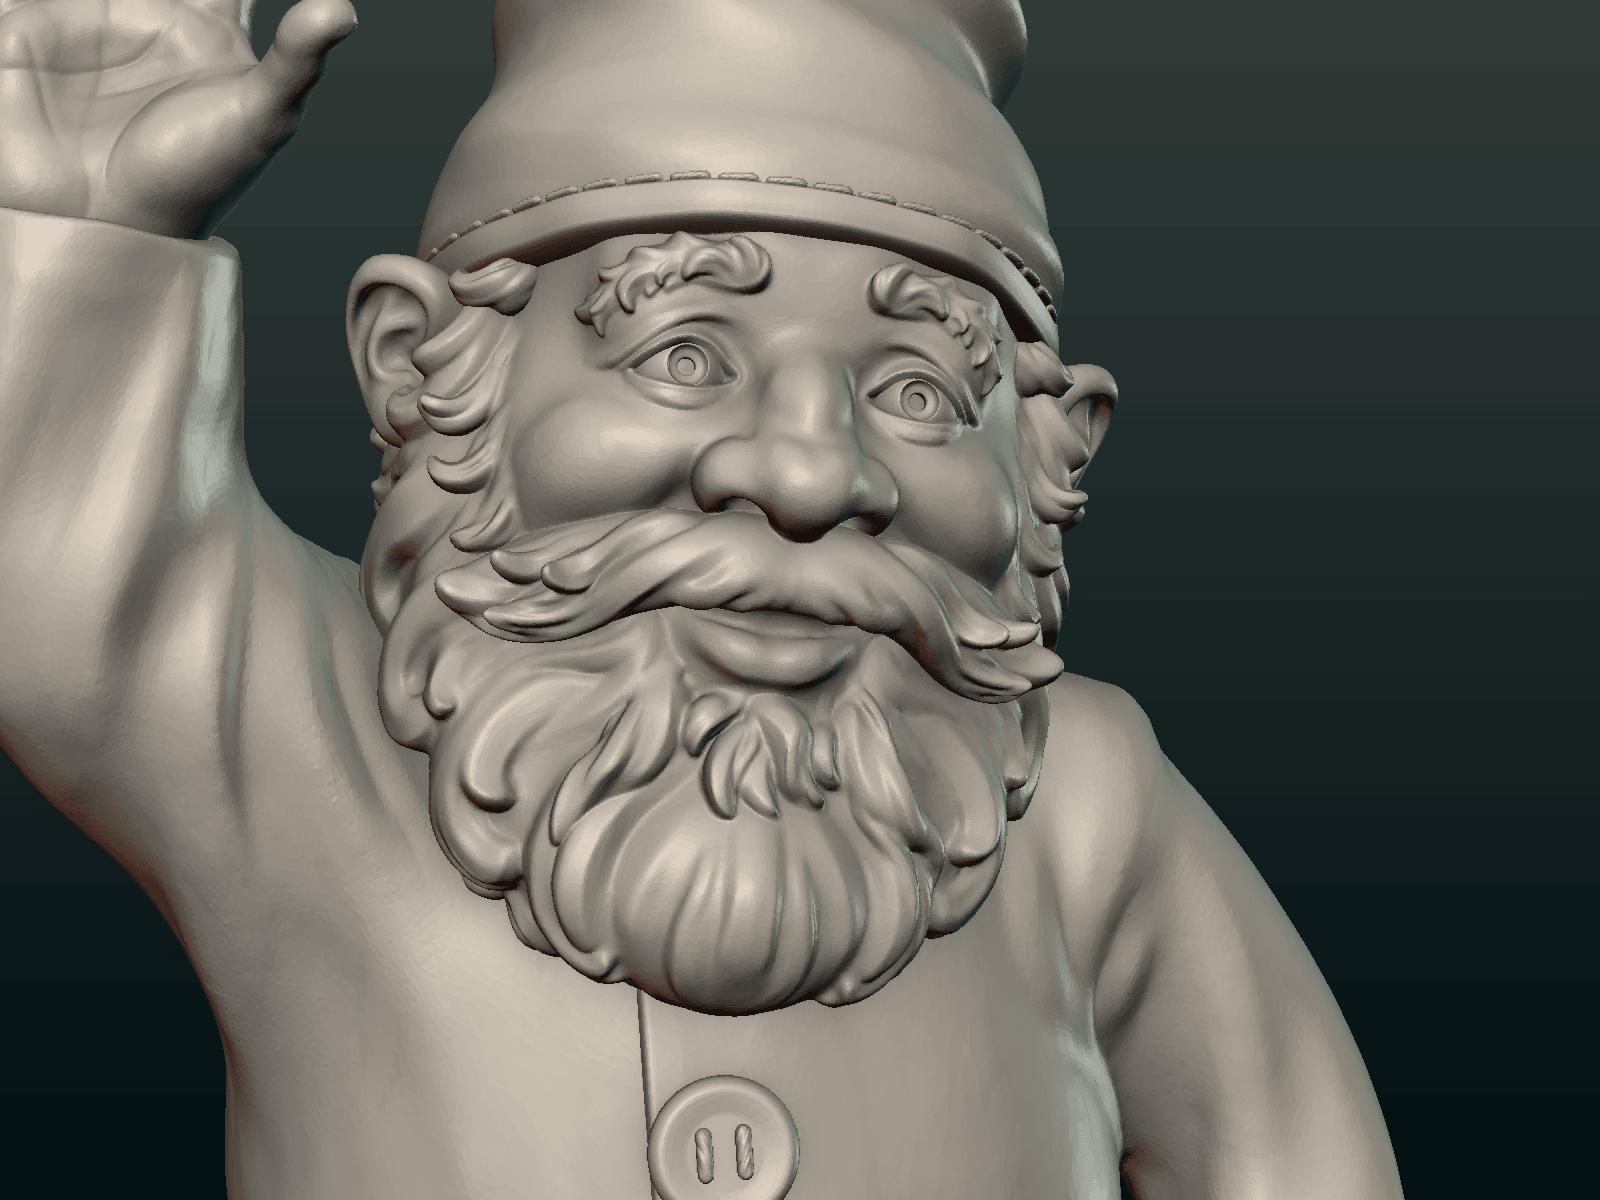 Garden_Gnome-12.png Download STL file Garden Gnome • 3D printing design, Skazok